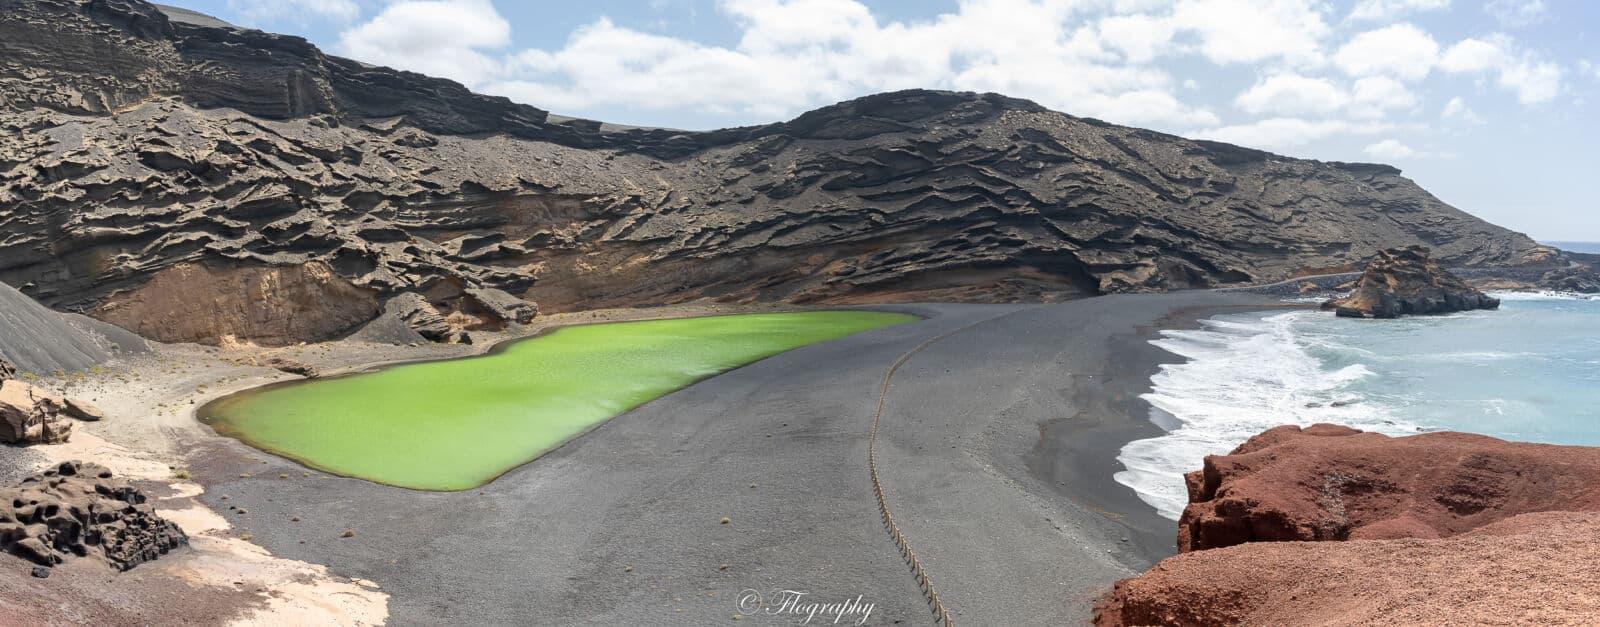 le lac vert de Charco de los Clicos à El Golfo à Lanzarote Canaries Espagne